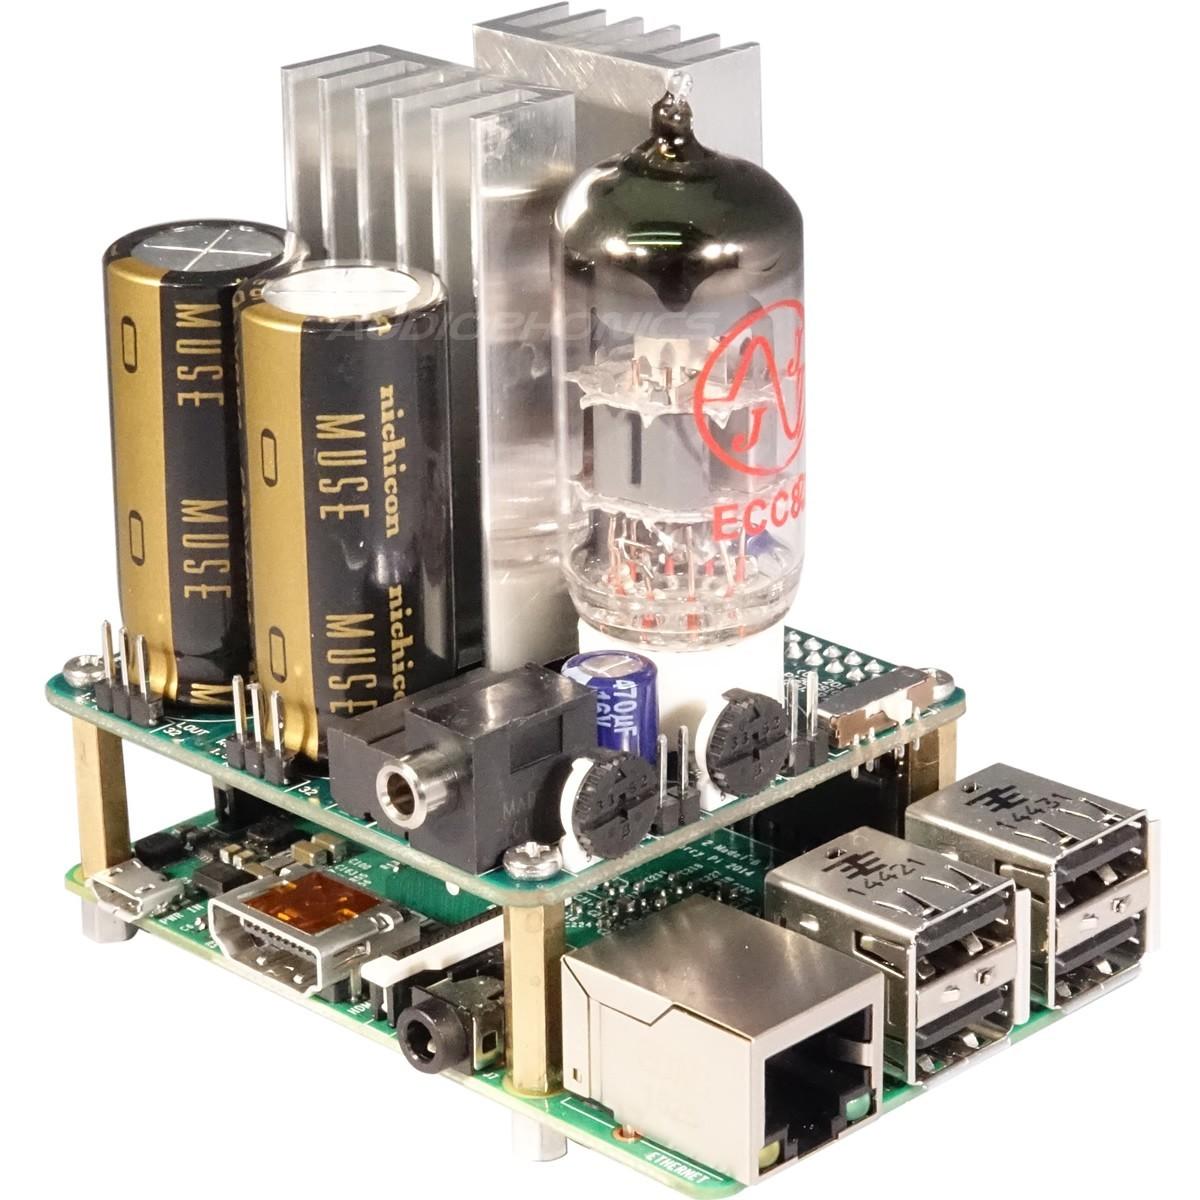 Pi 2 Design 503HTA I2S DAC Hybrid Tube Amp for the Raspberry Pi